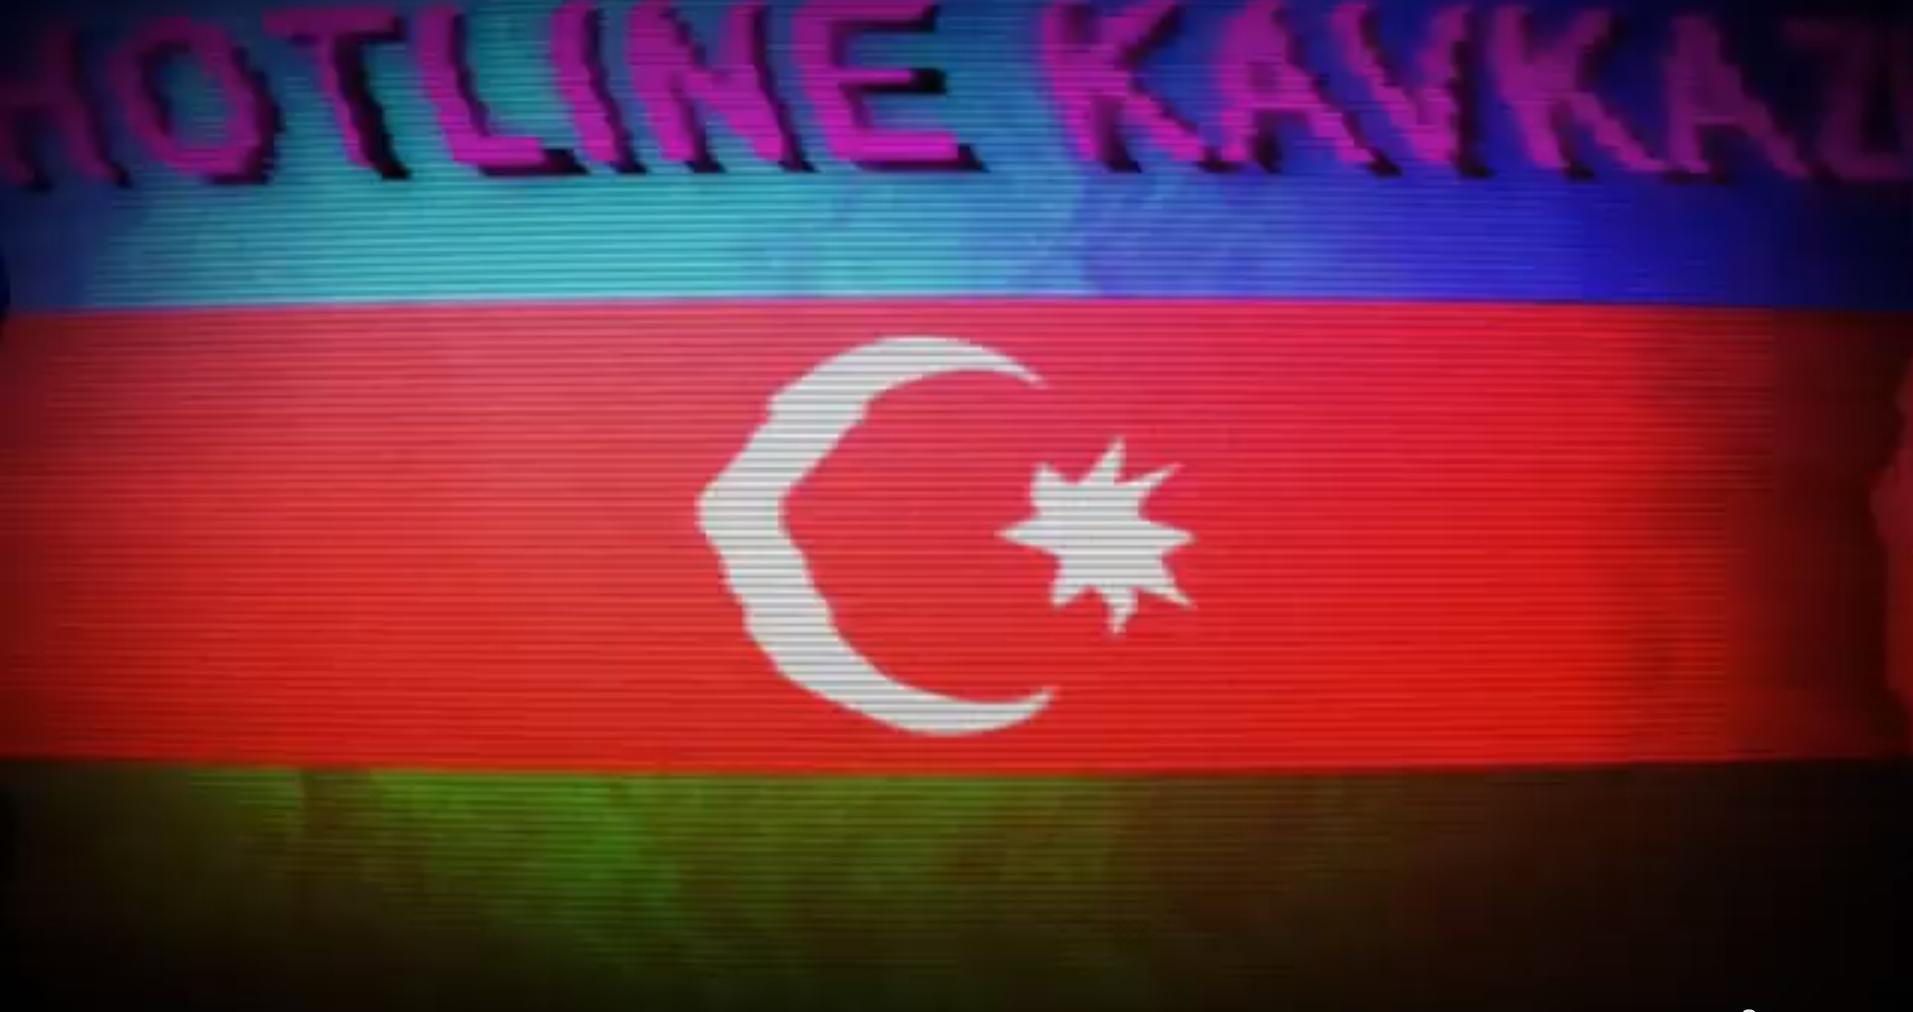 hotline kavkaz hotline miami история о хаче